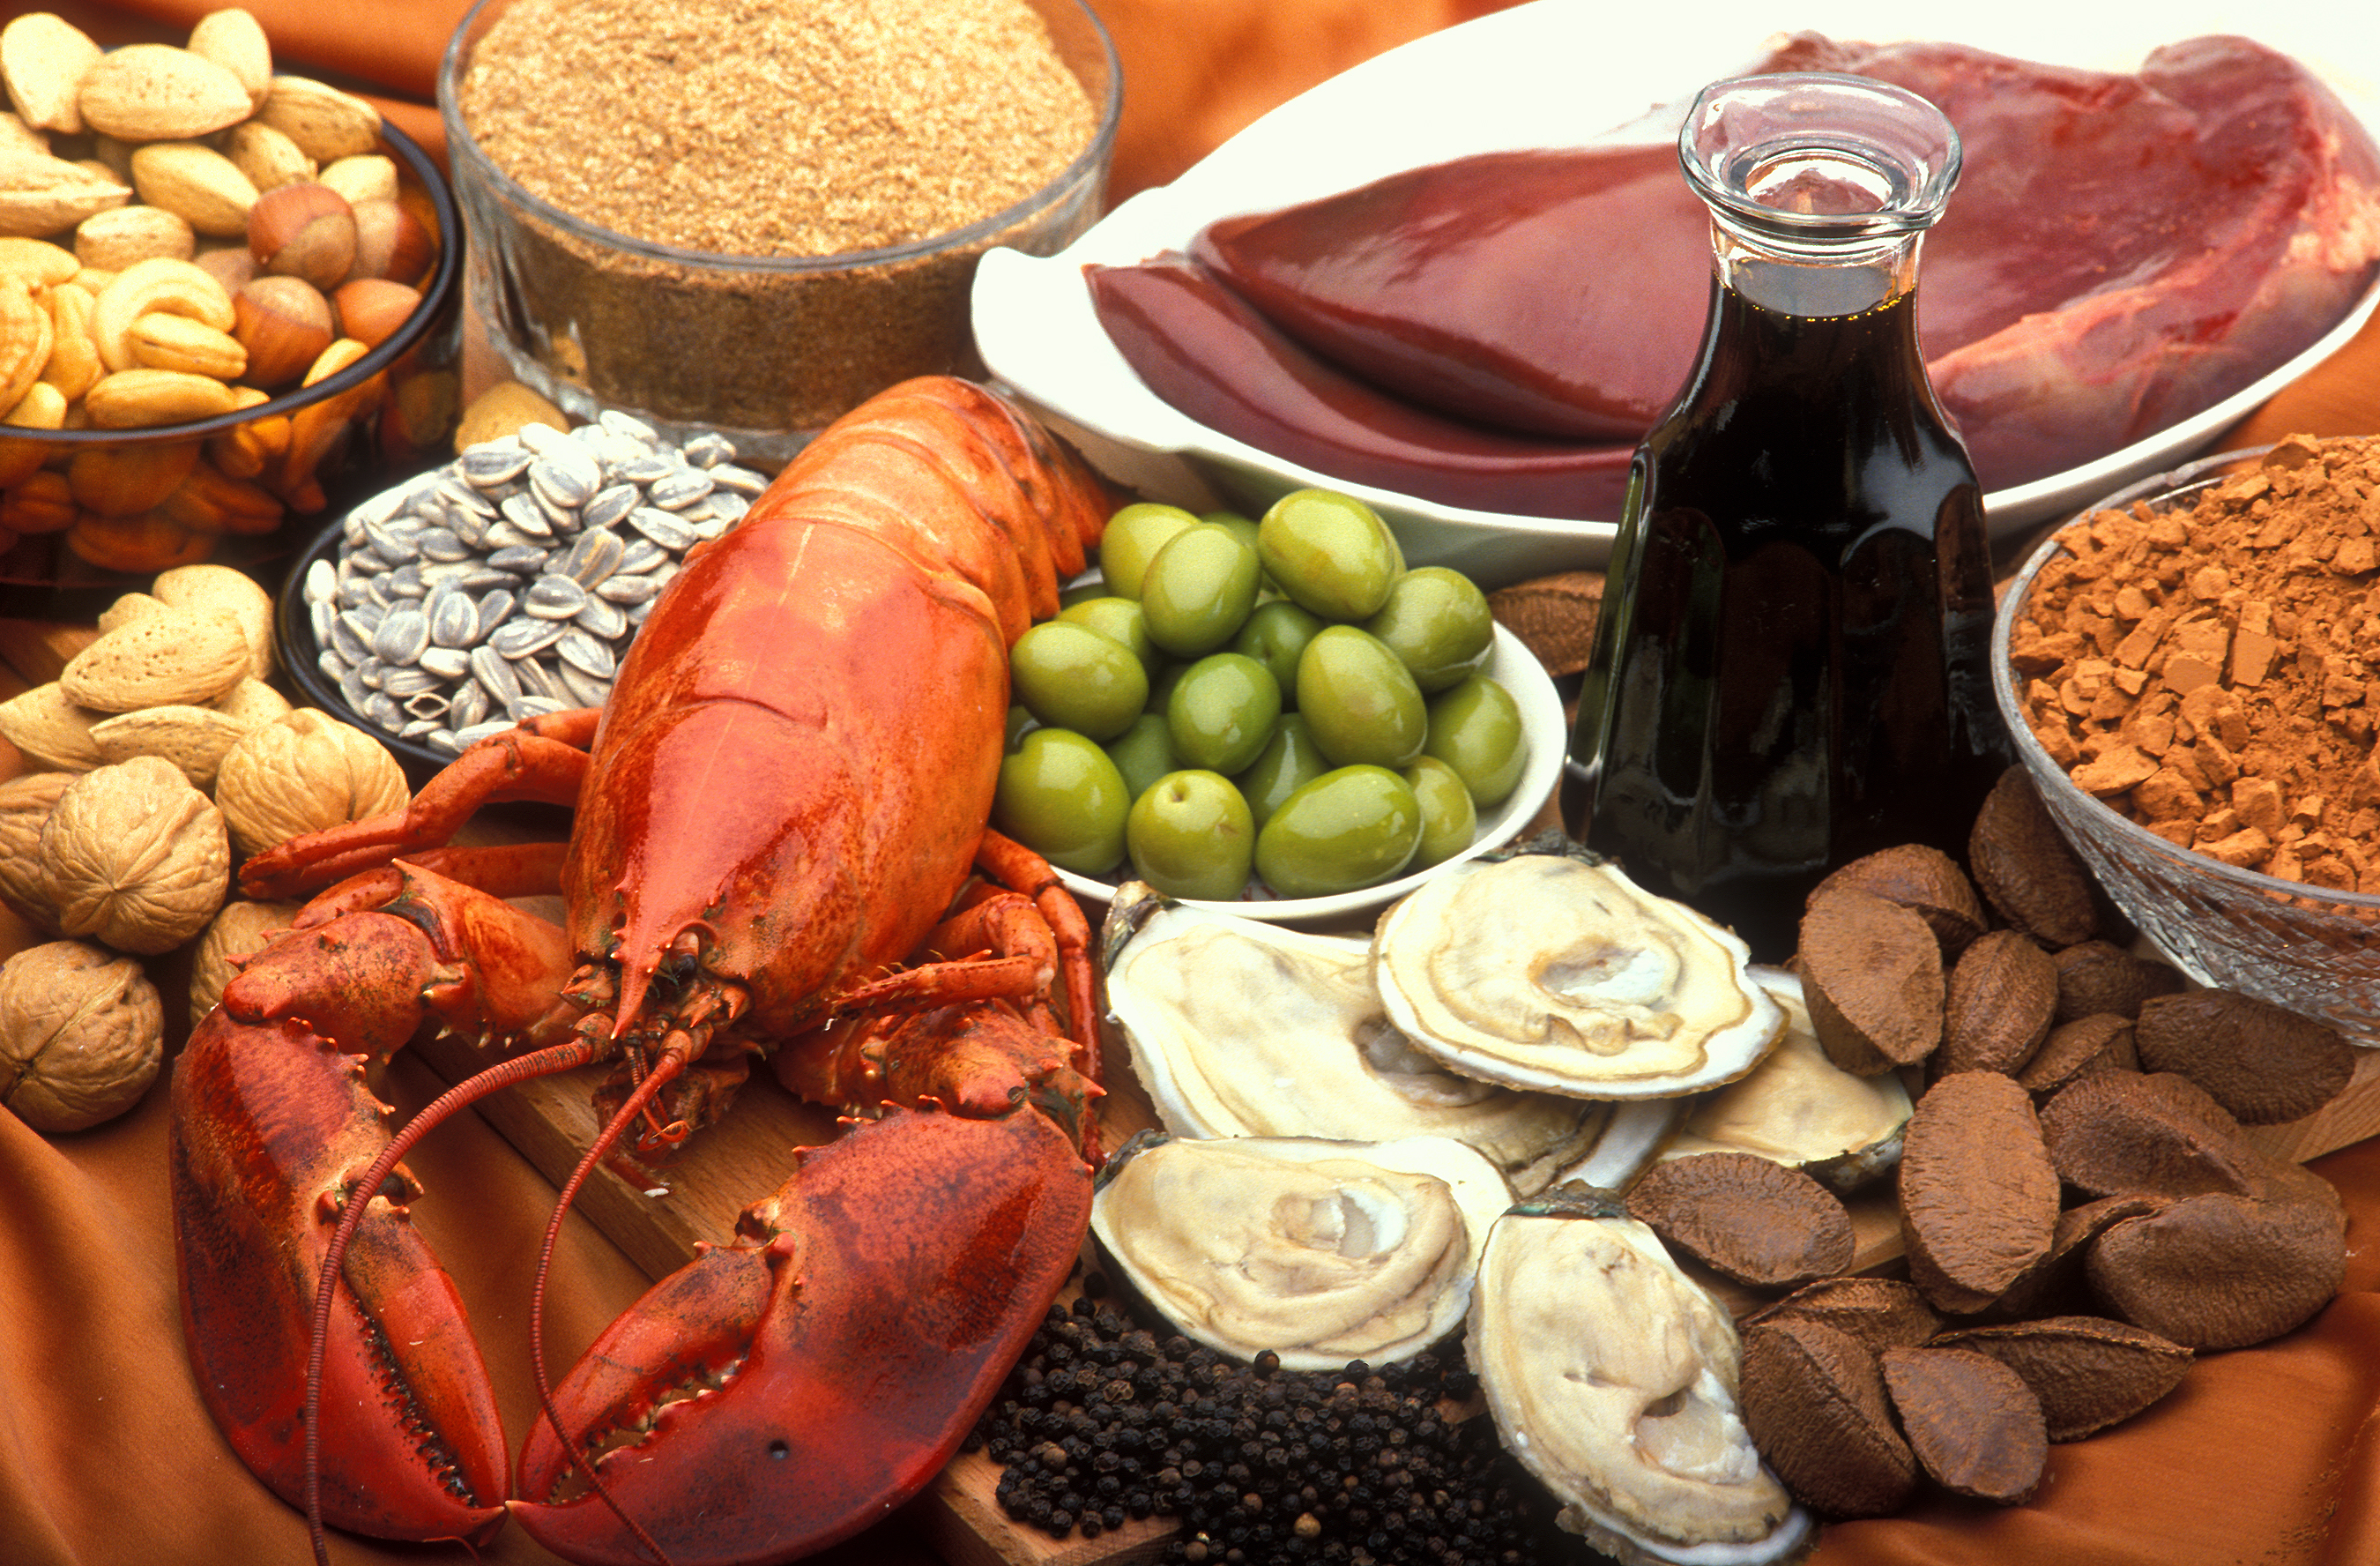 File:ARS copper rich foods.jpg - Wikipedia